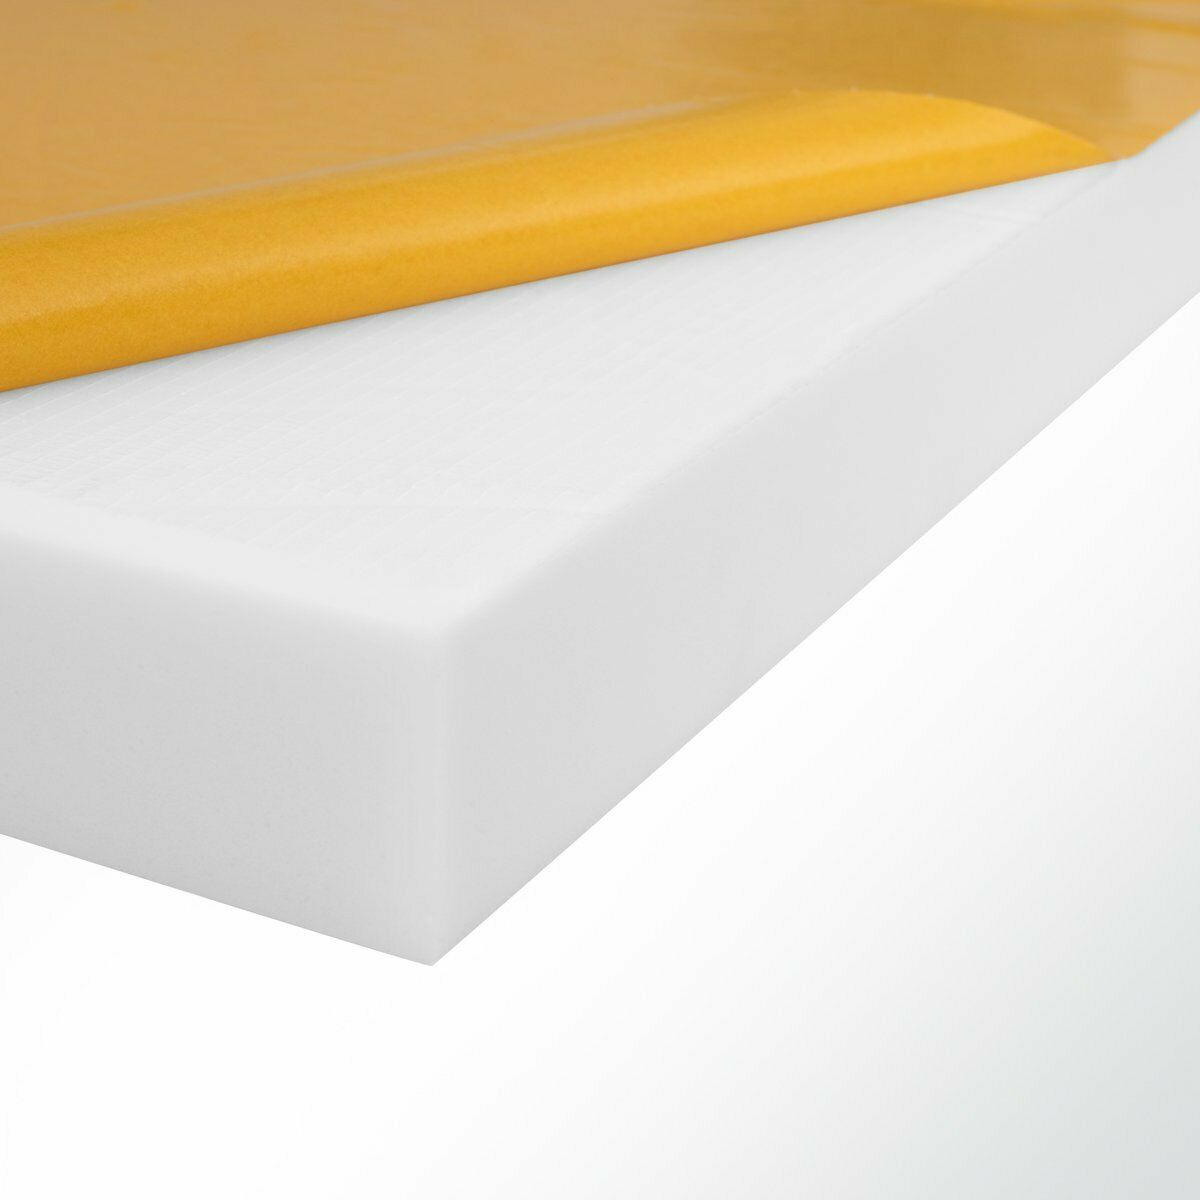 Schall-Absorber aus Basotect®  Melaminharz Schaumstoff selbstklebend 100x50x10cm